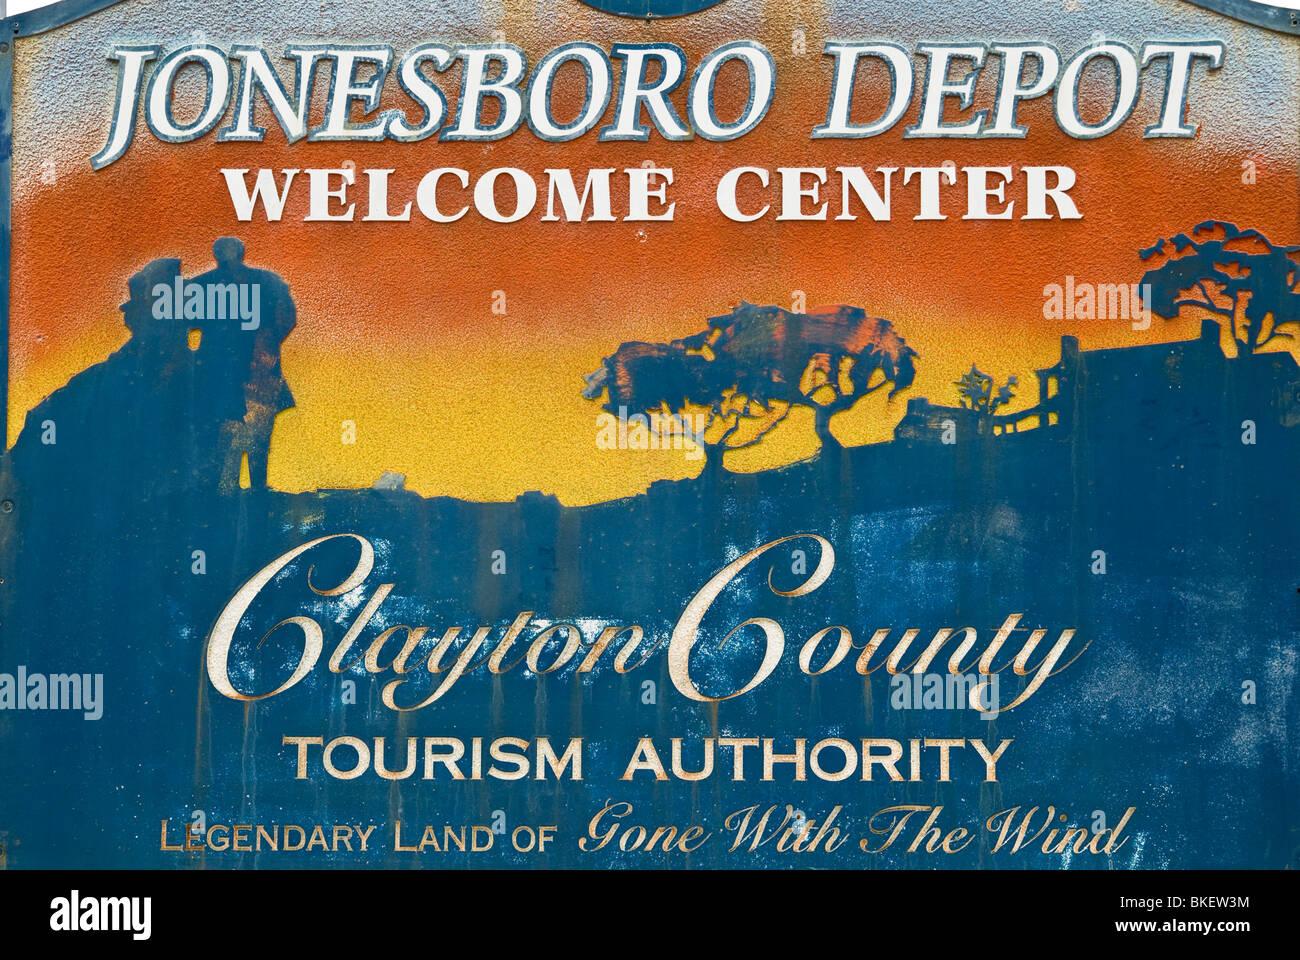 'Gone with the Wind' tourism sign in Jonesboro, Georgia, USA - Stock Image